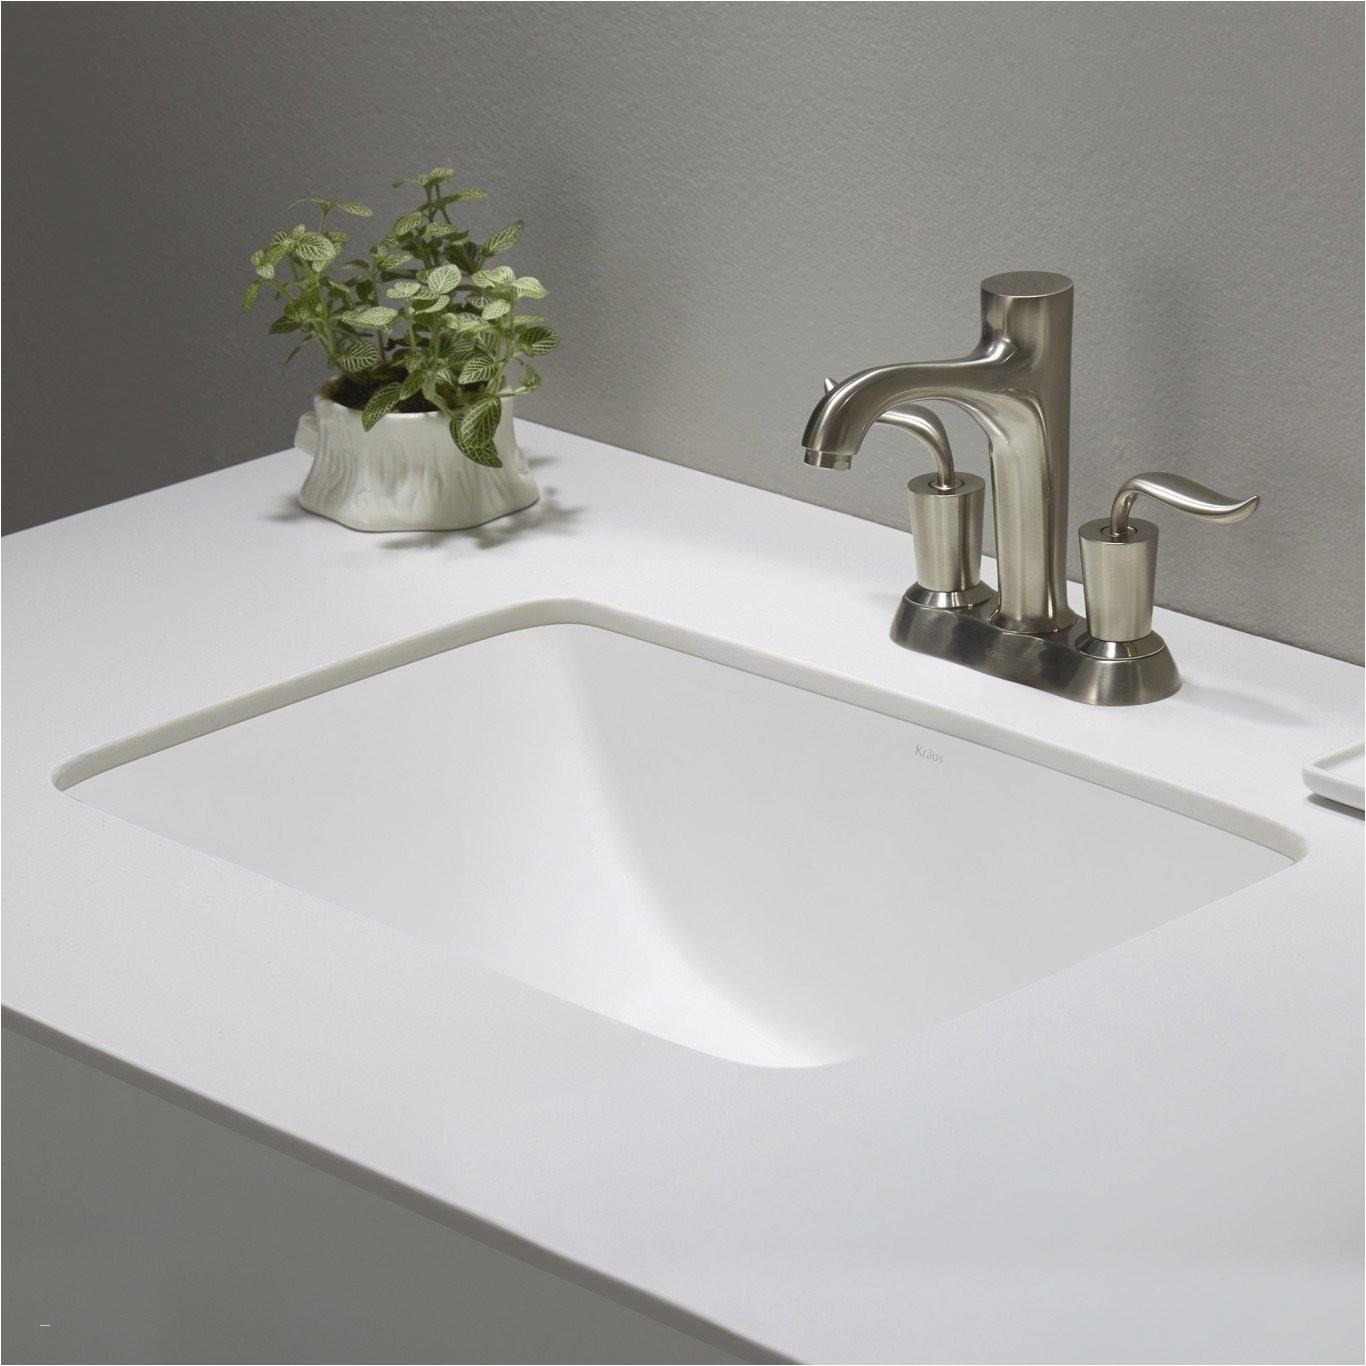 Bathroom Furniture Ideas New Bathroom Undermount Sinks Decorative Very Small Kohler Rectangular H